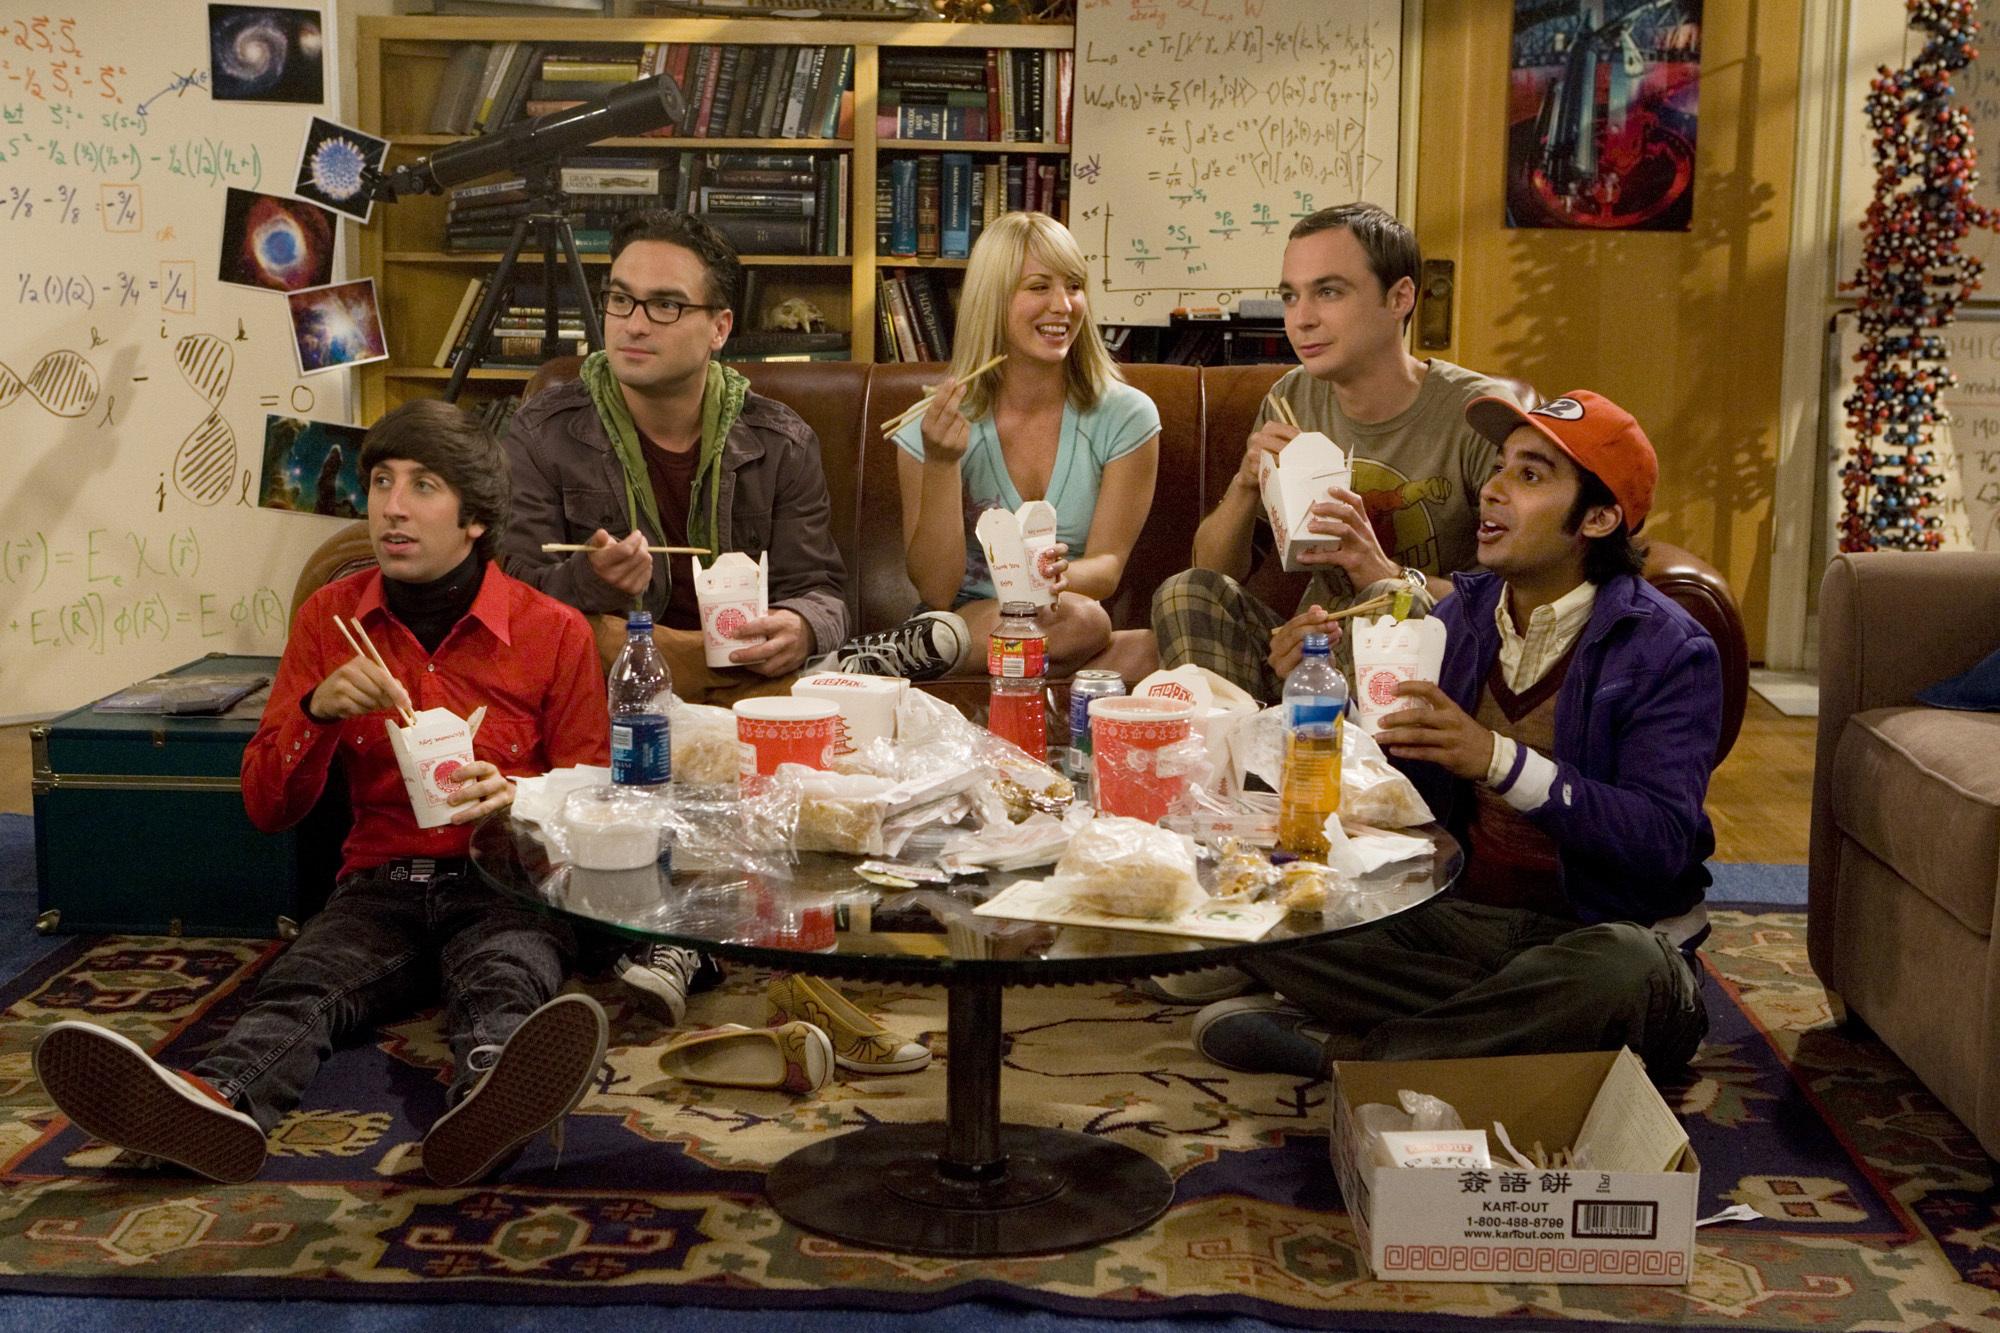 After 12 Seasons, 'Big Bang' Writers Bid Farewell To Their 'Surrogate Family'